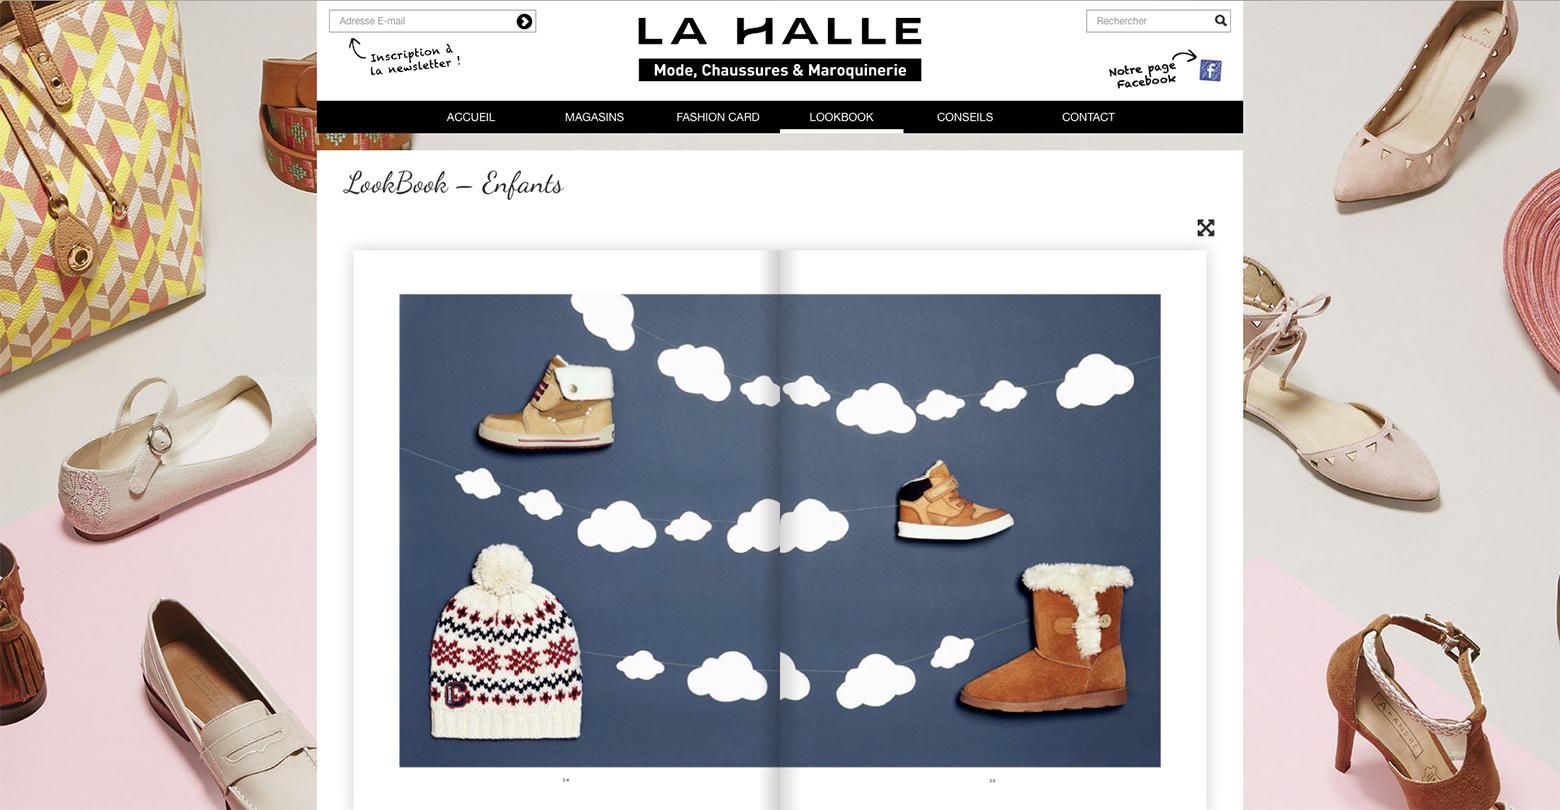 La Halle WNG Agence Digitale